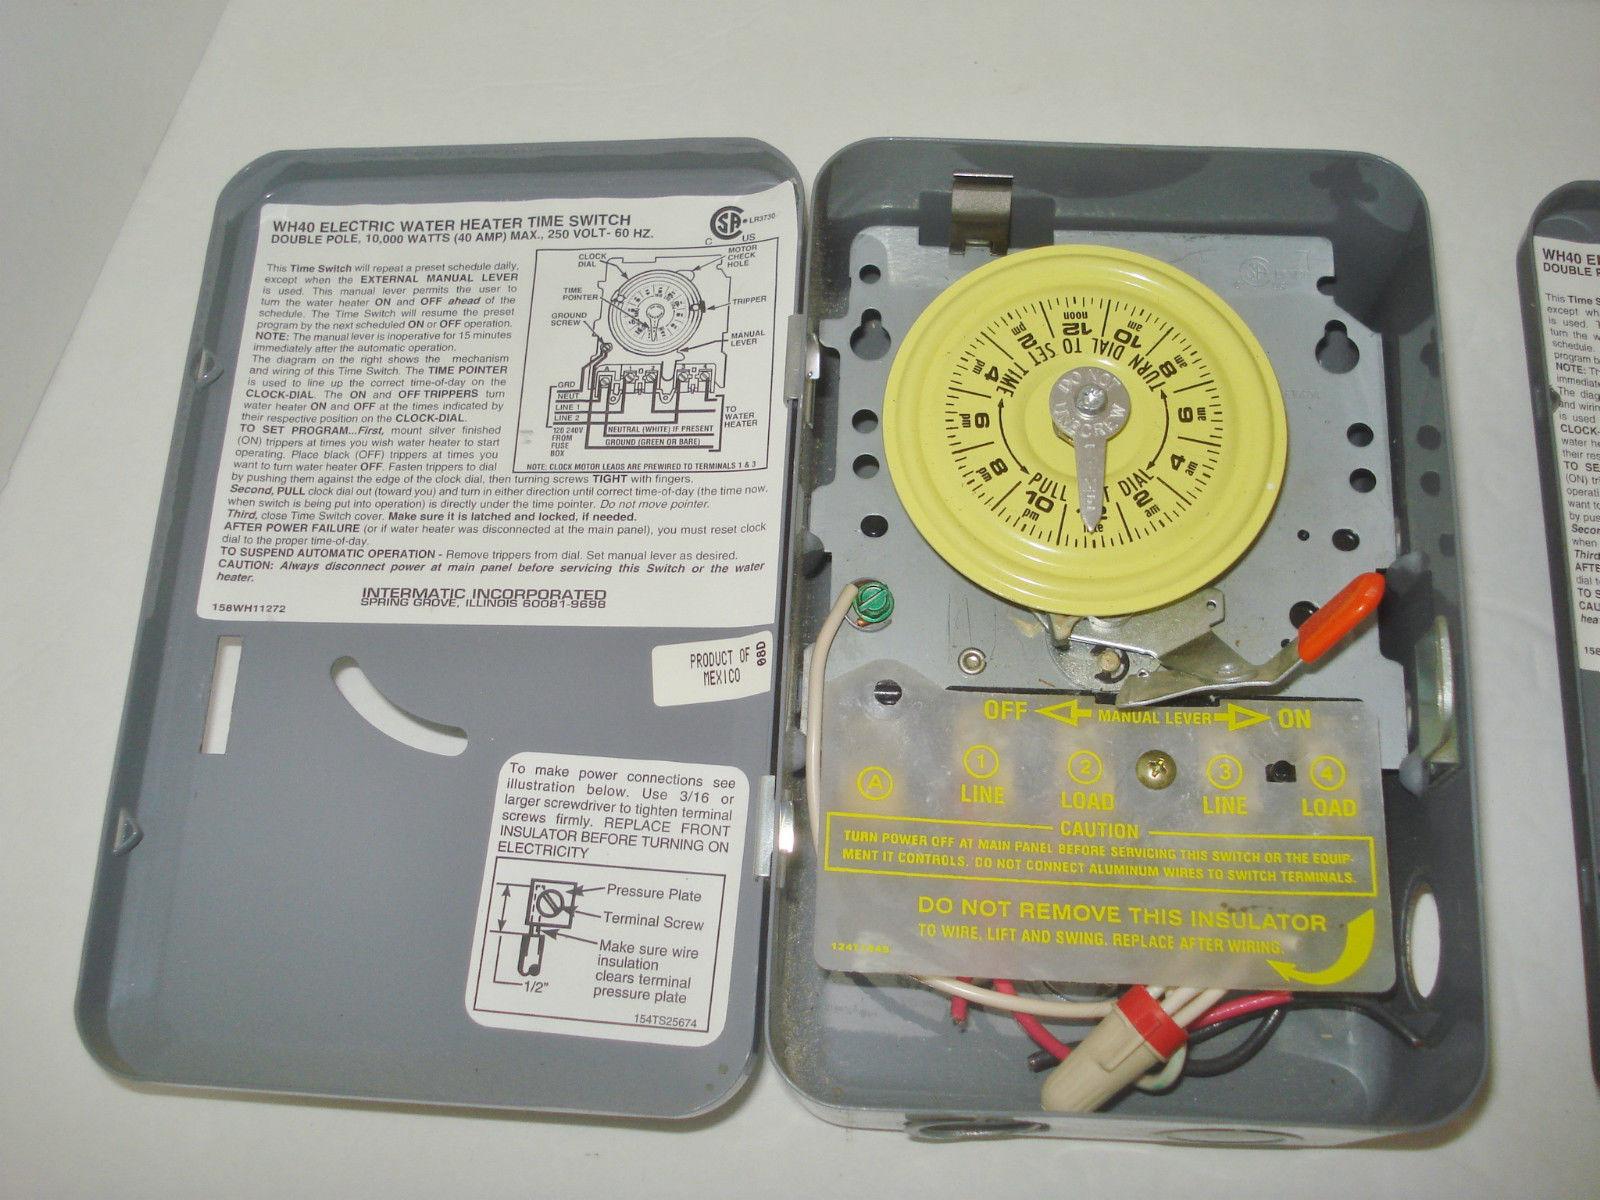 2002 chevy express fuse box diagram lil gray box diagram